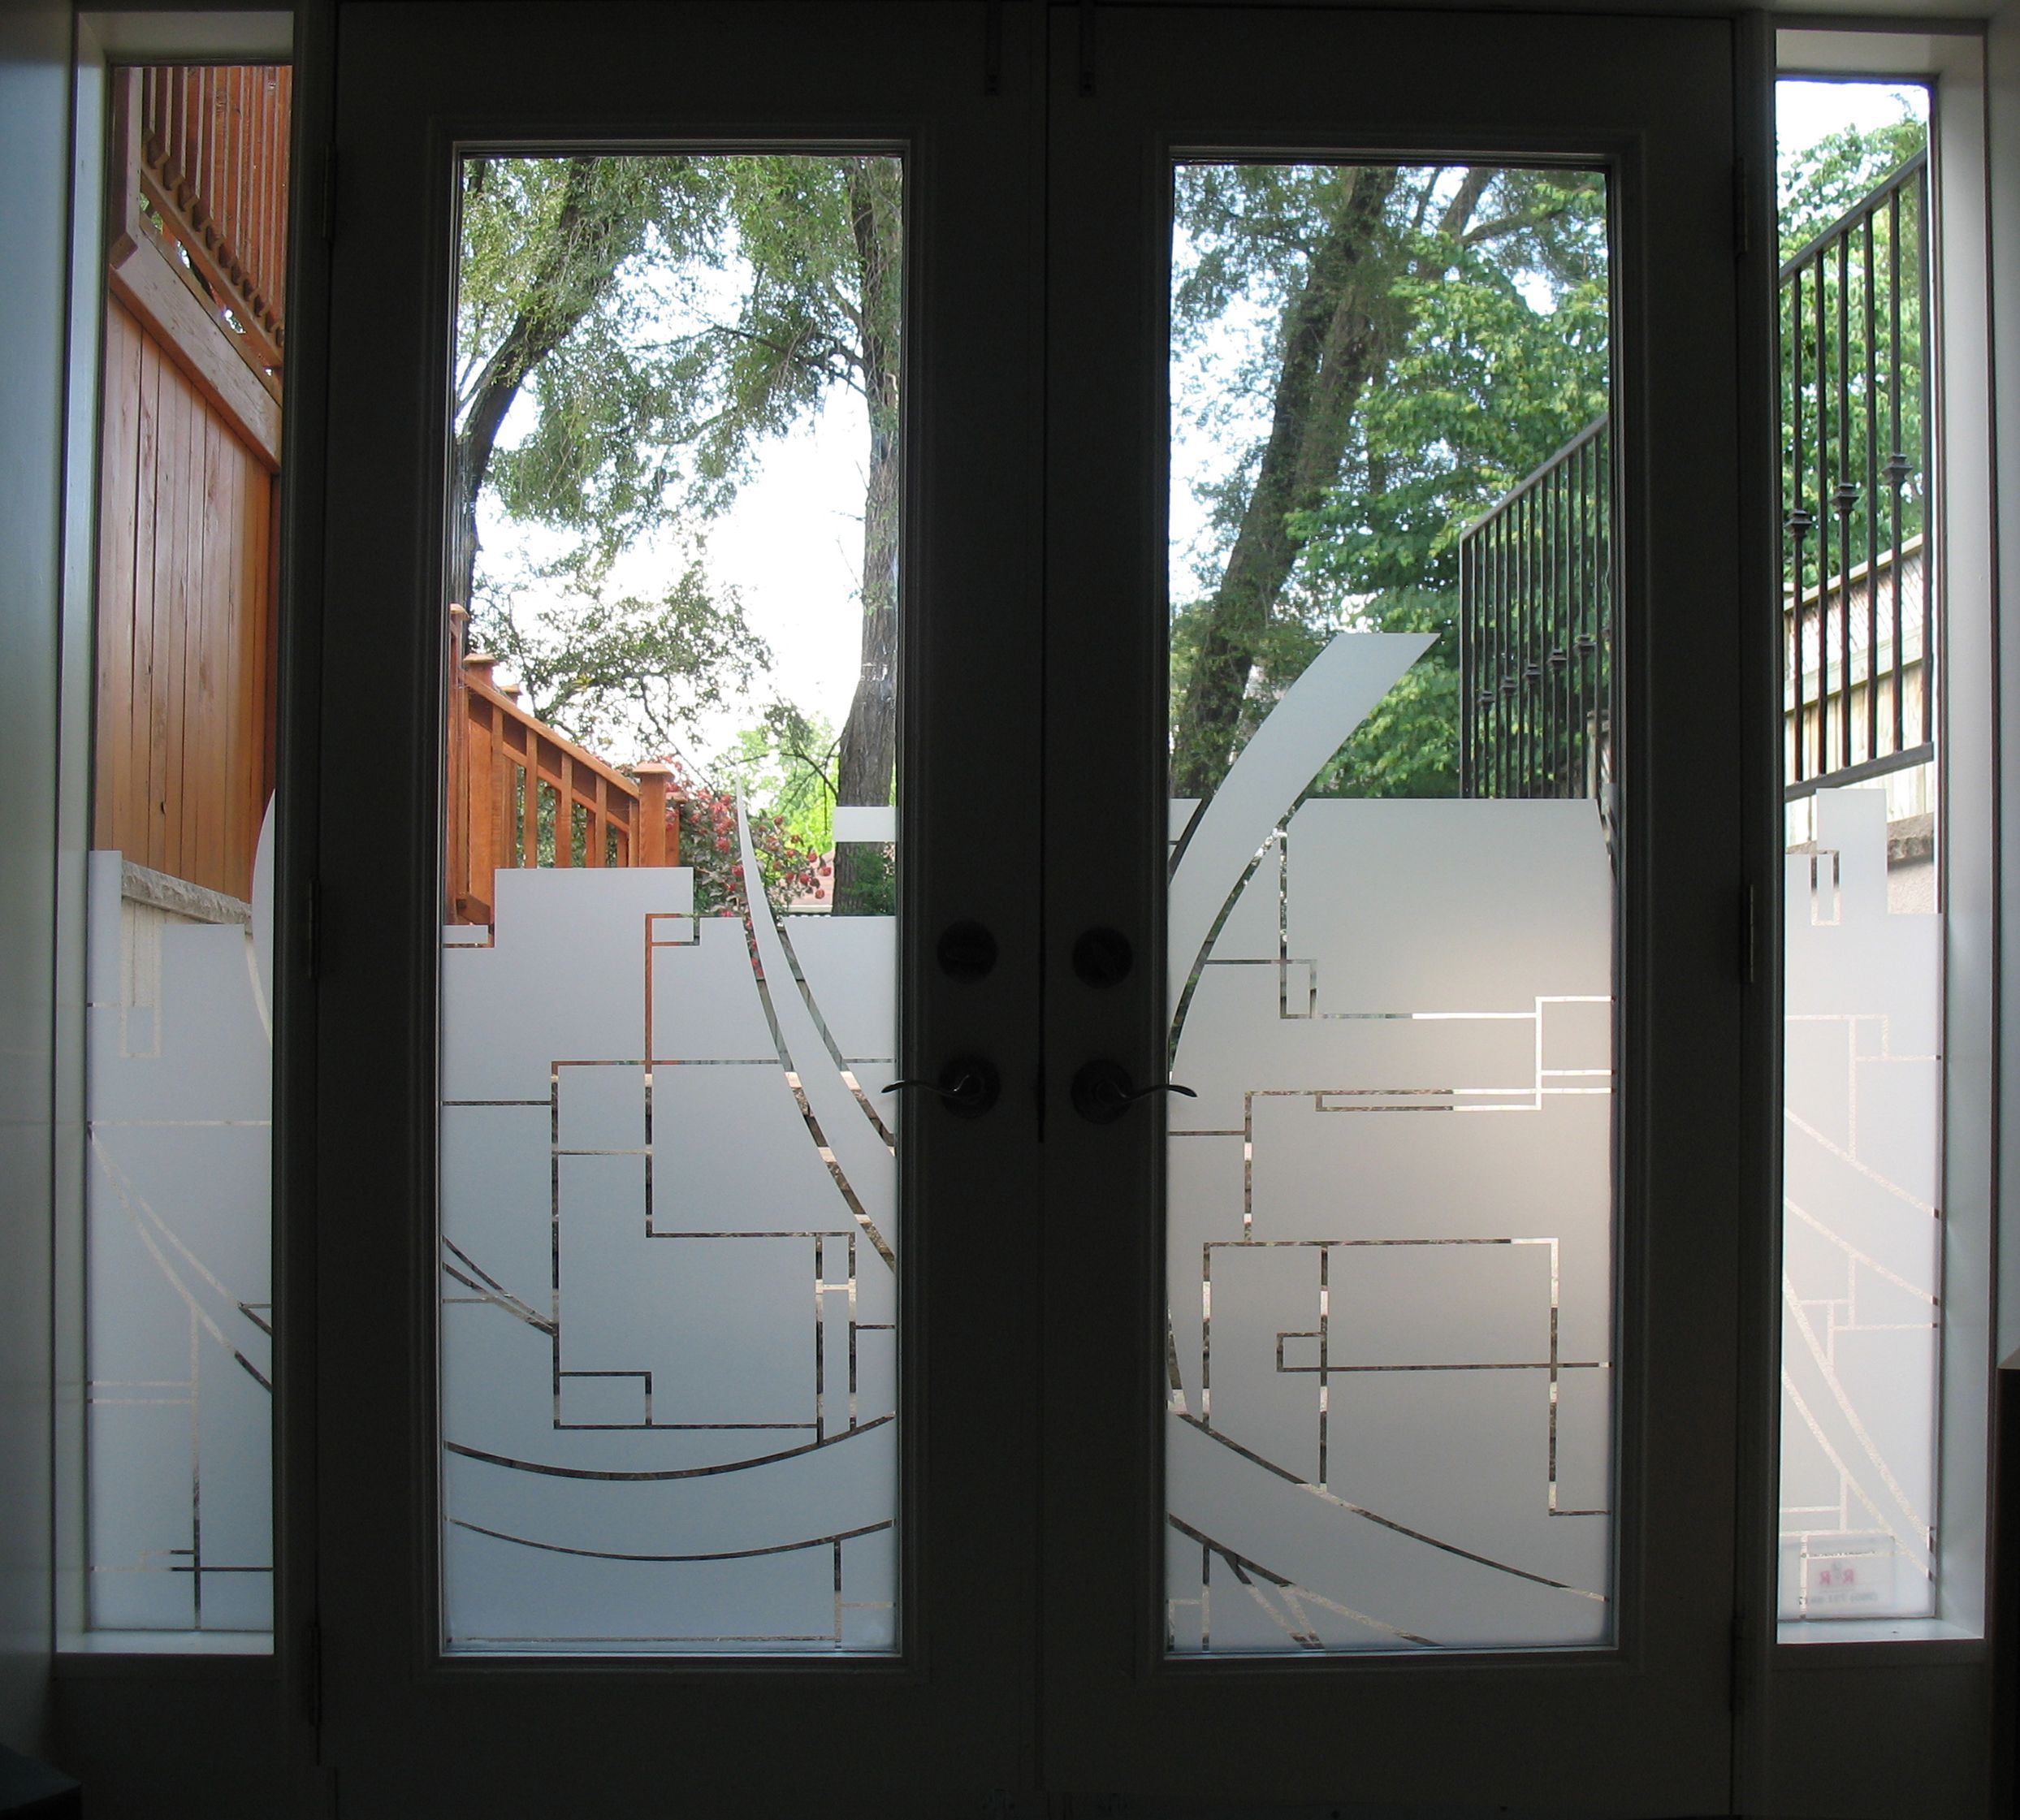 Custom graphics cut in frost on residential door window graphics crescents custom graphic window film in residential door rubansaba